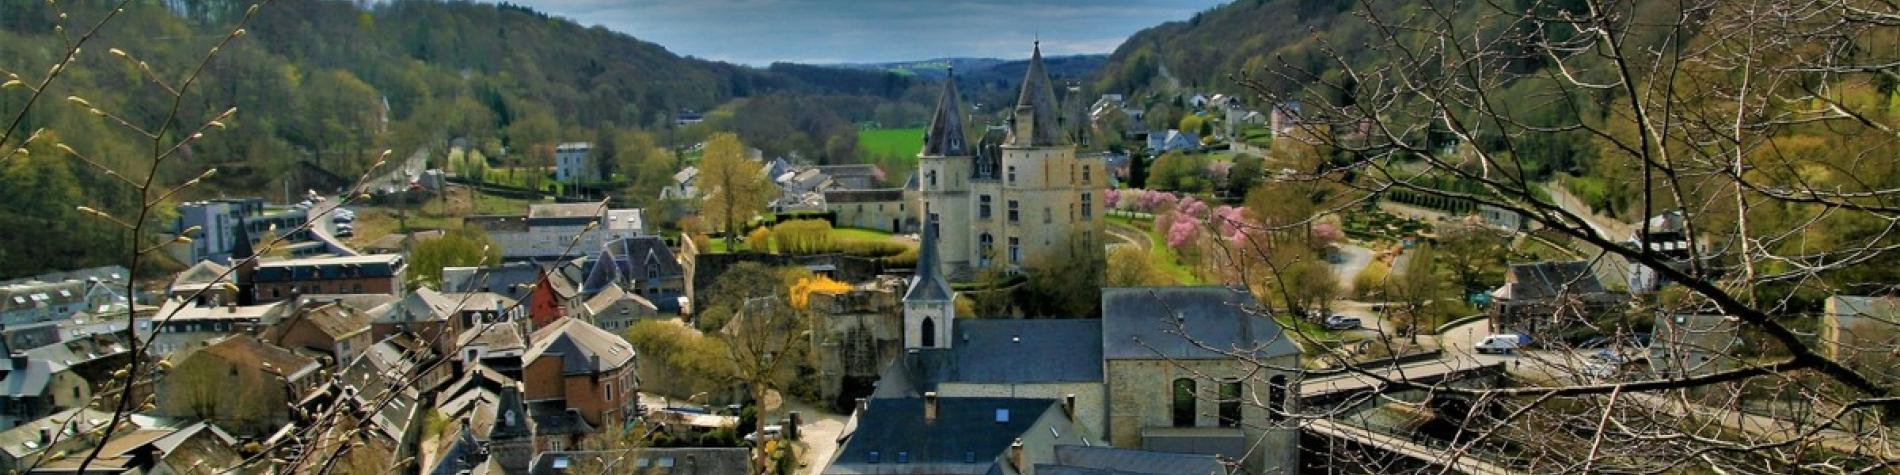 Geopark Famenne-Ardenne-Ville de Durbuy